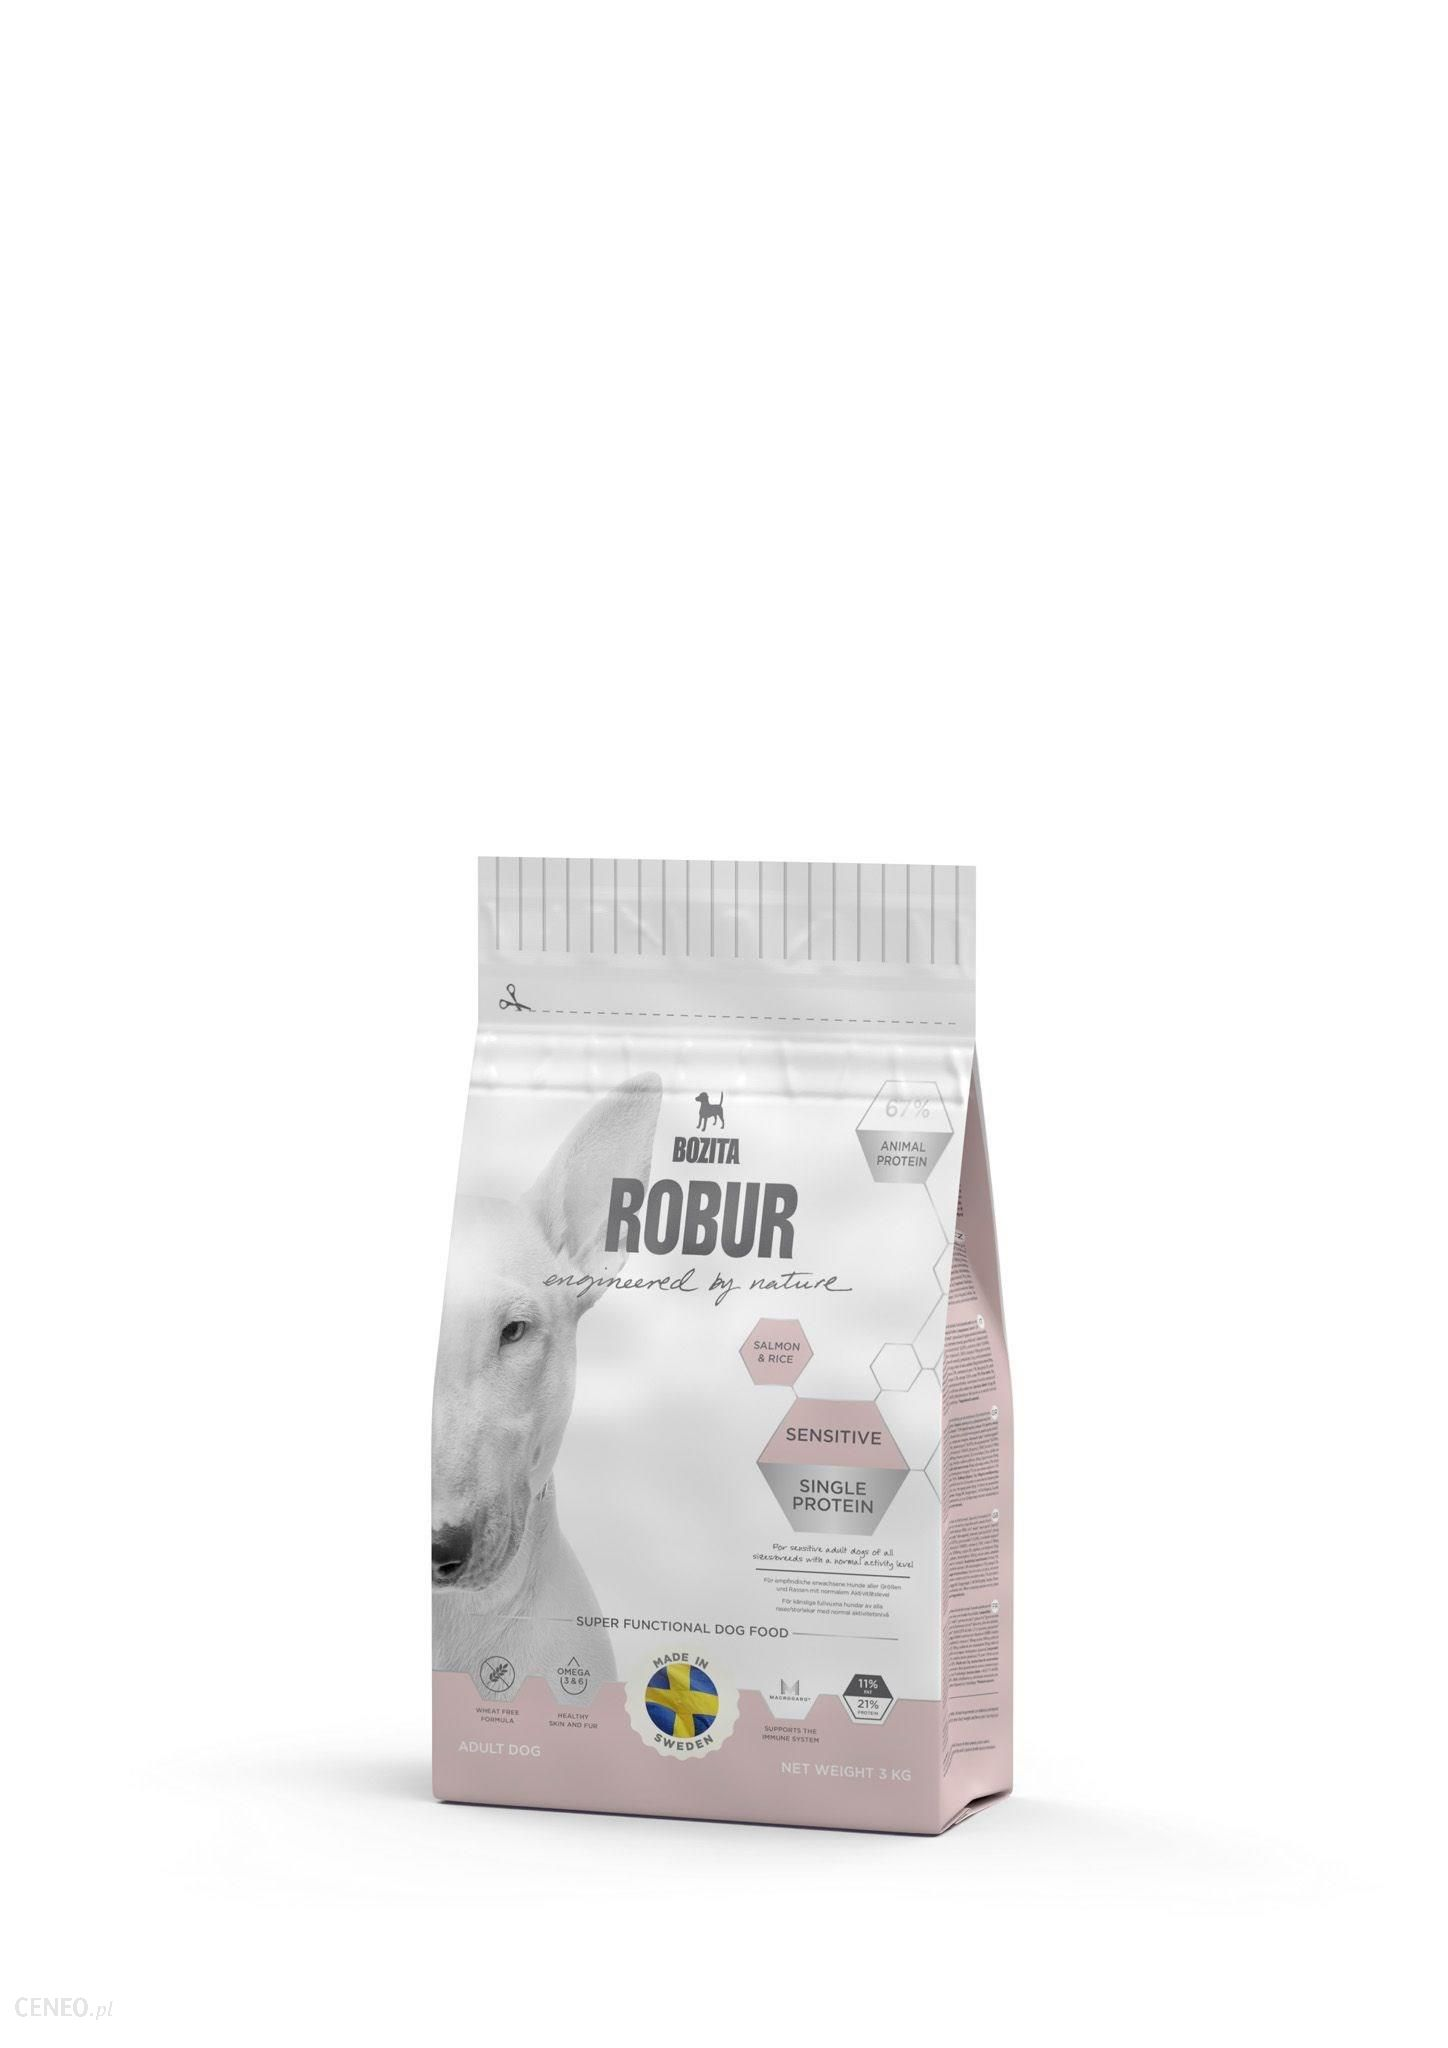 Bozita Robur Sensitive Single Protein Salmon & Rice 3kg